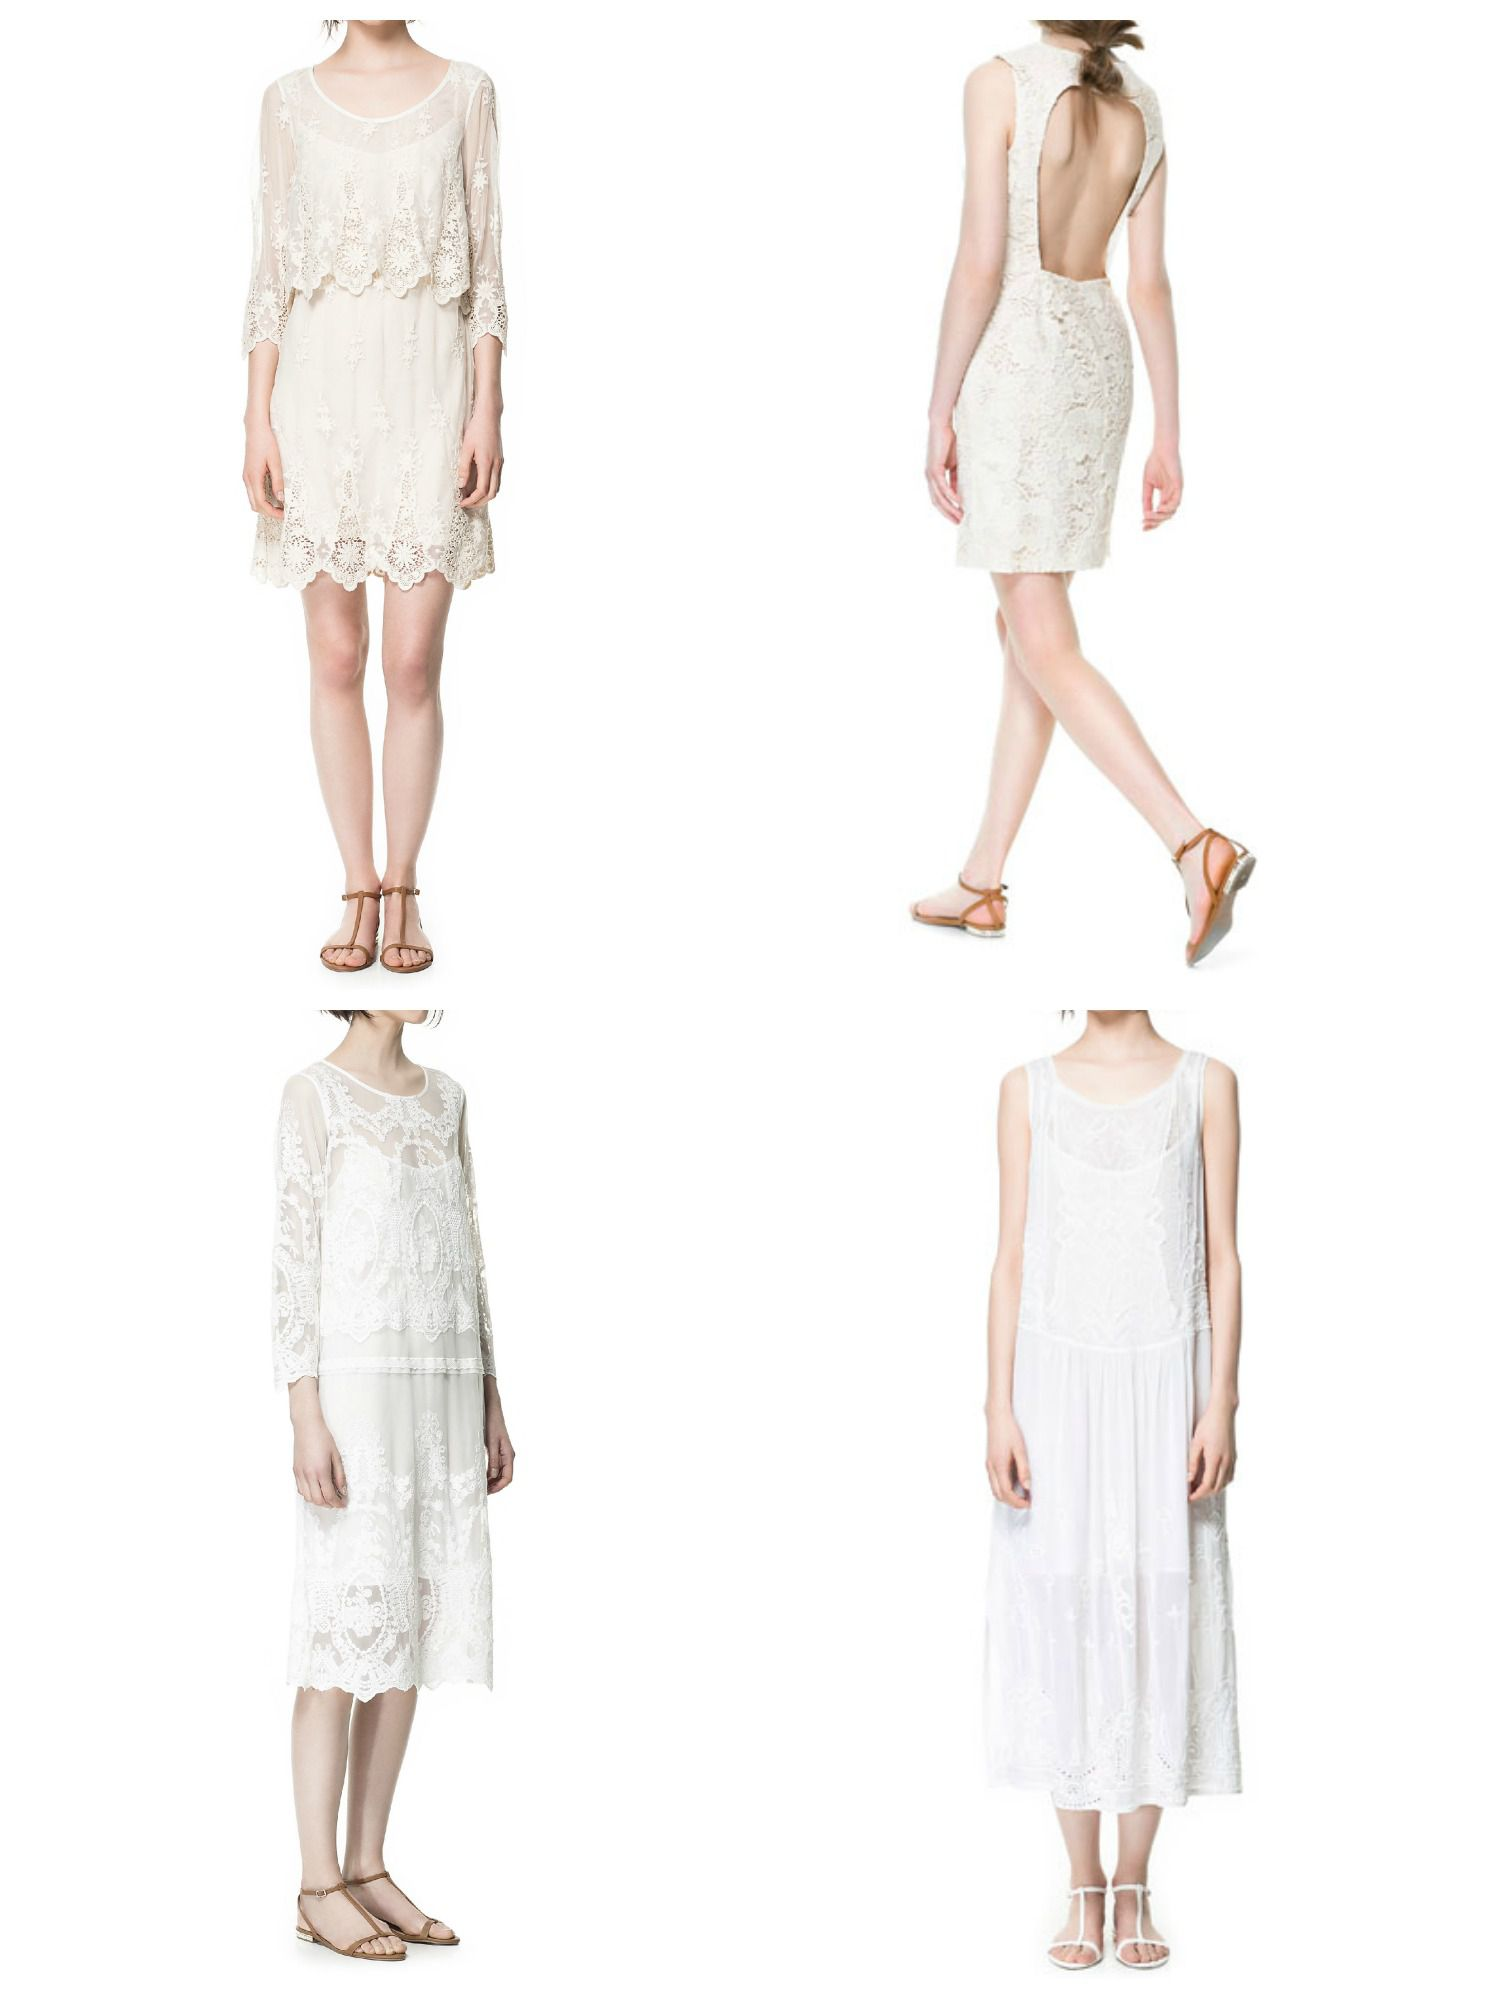 Short Lace Wedding Dresses Rustic Wedding Chic